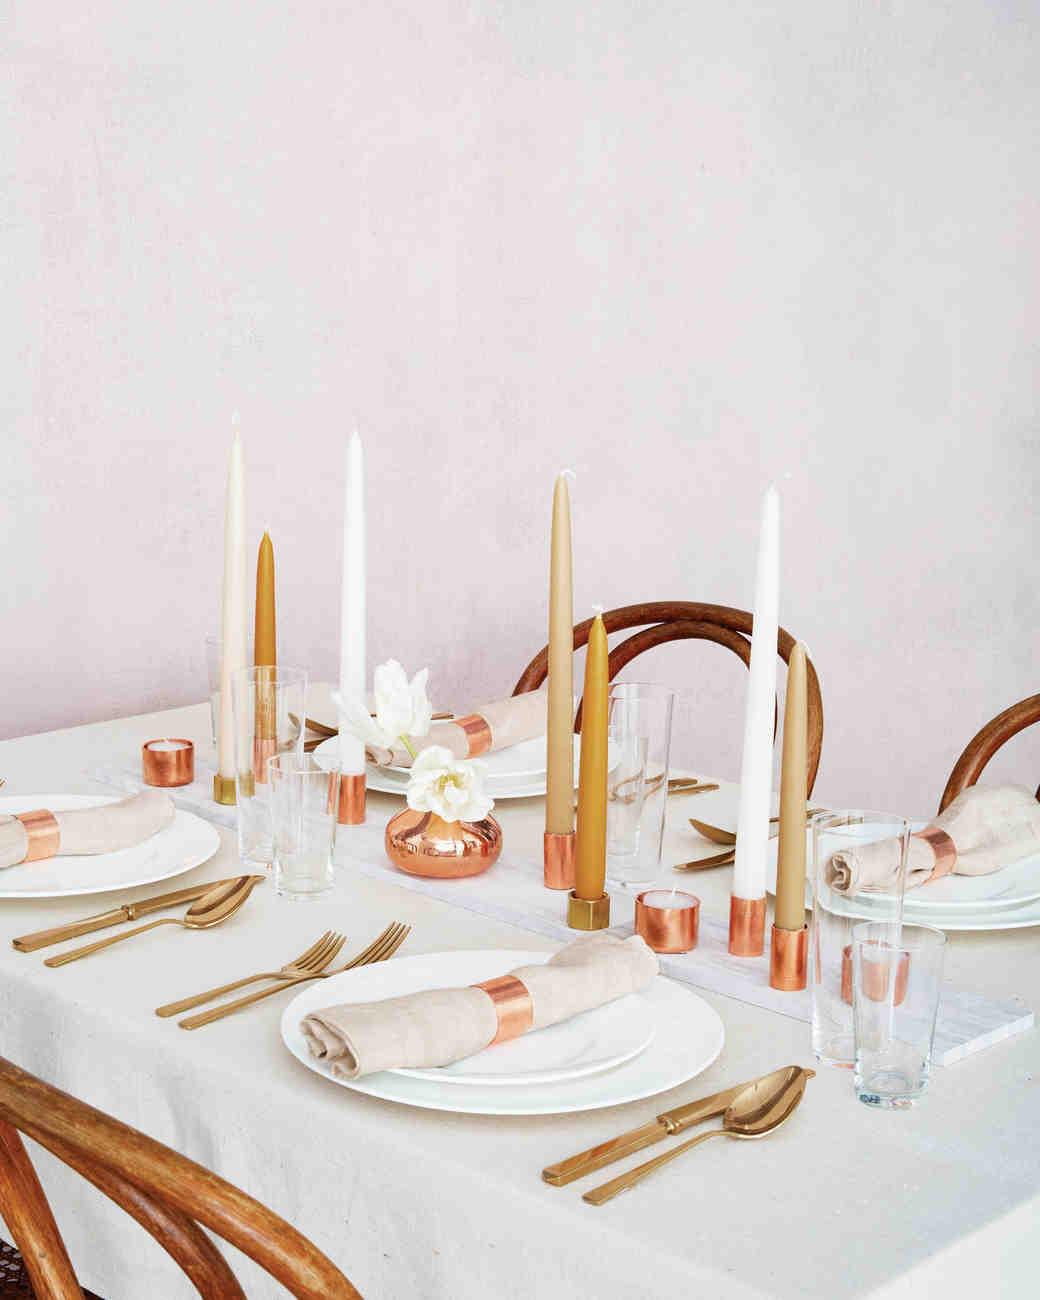 Artistic Silver Copper Candle Centerpiece Diy Wedding Centerpieces We Love Martha Stewart Weddings Wedding Centerpiece Ideas Wedding Centerpiece Ideas Navy ideas Wedding Centerpiece Ideas